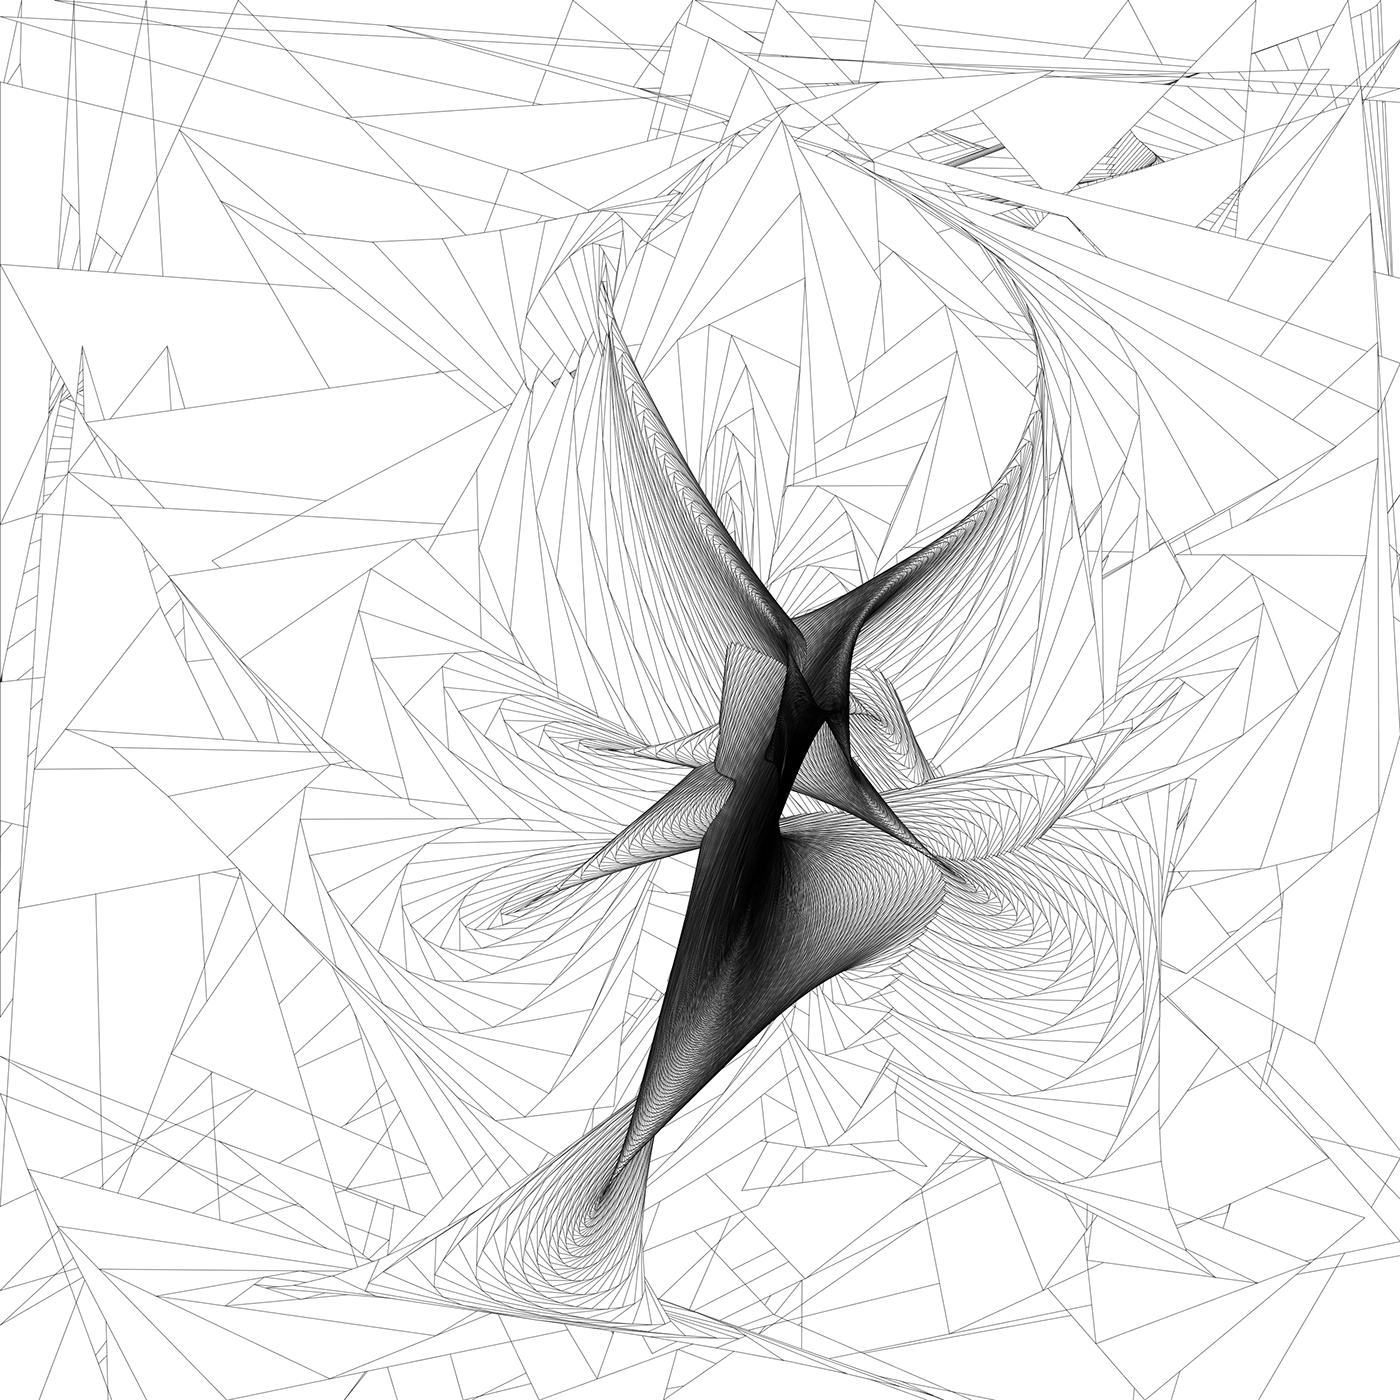 generative generative art algorithmic creative coding math